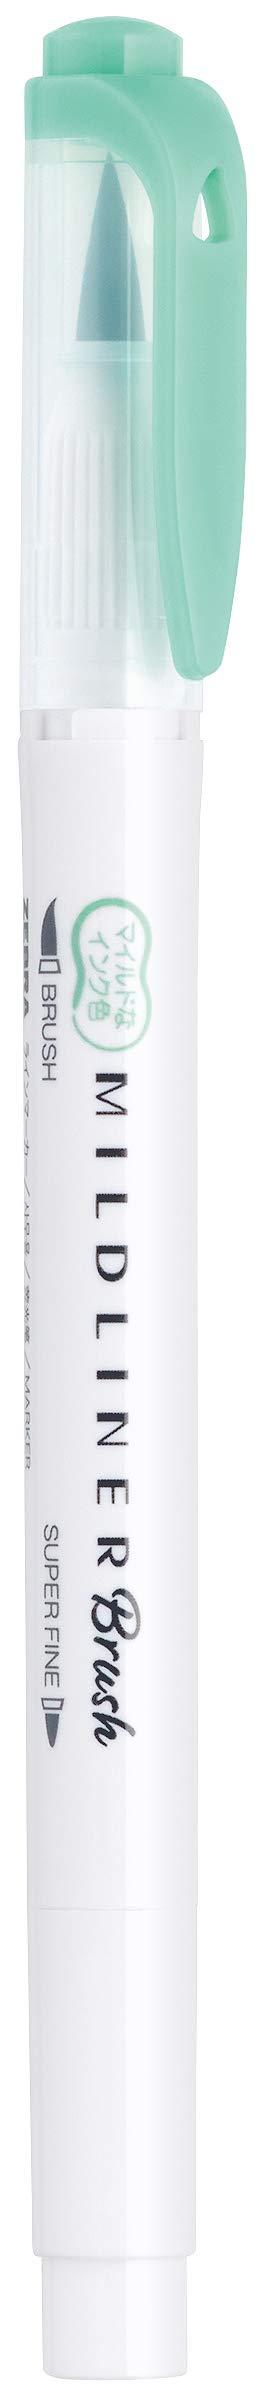 Zebra Pen Mildliner Double Ended Brush and Fine Tip Pen, Assorted Colors, 15-Count by Zebra Pen (Image #3)